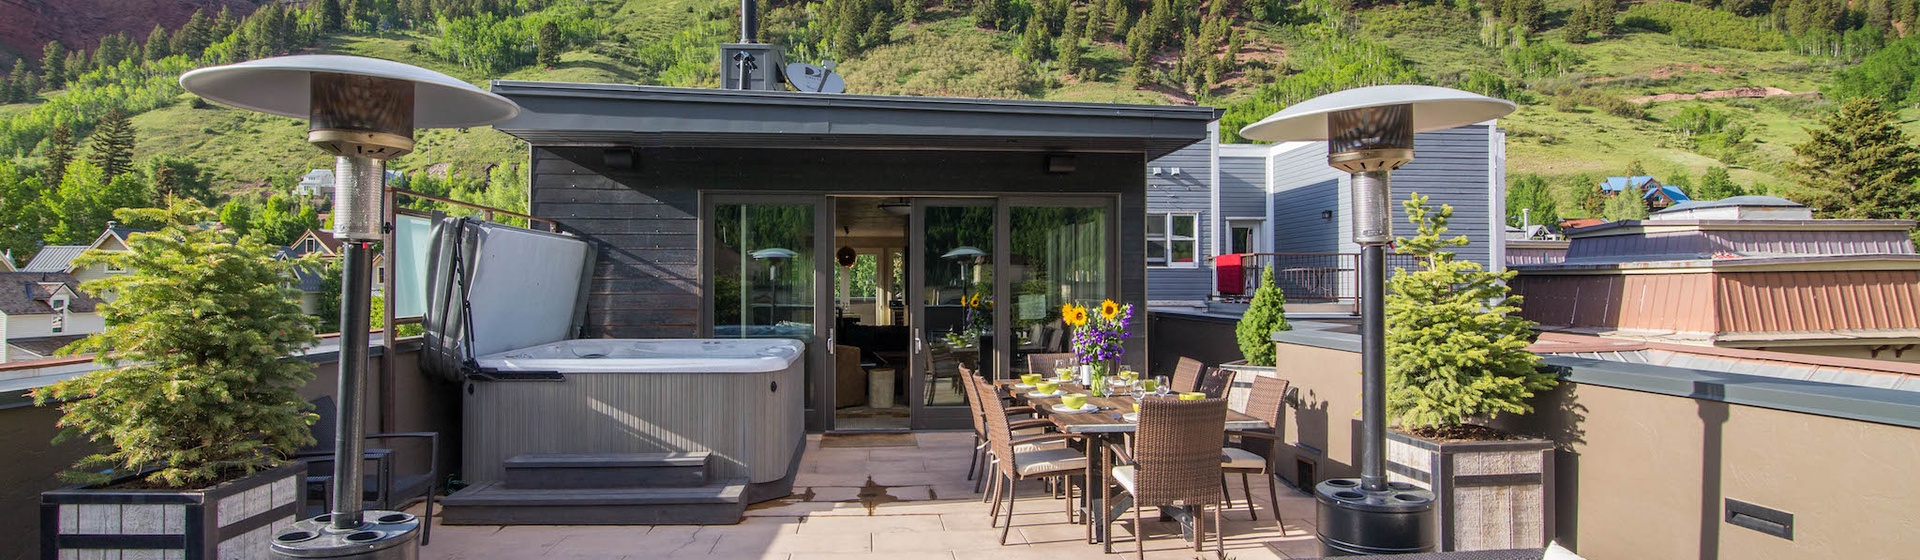 17-Telluride-Trulux-Penthouse-Deck.jpg